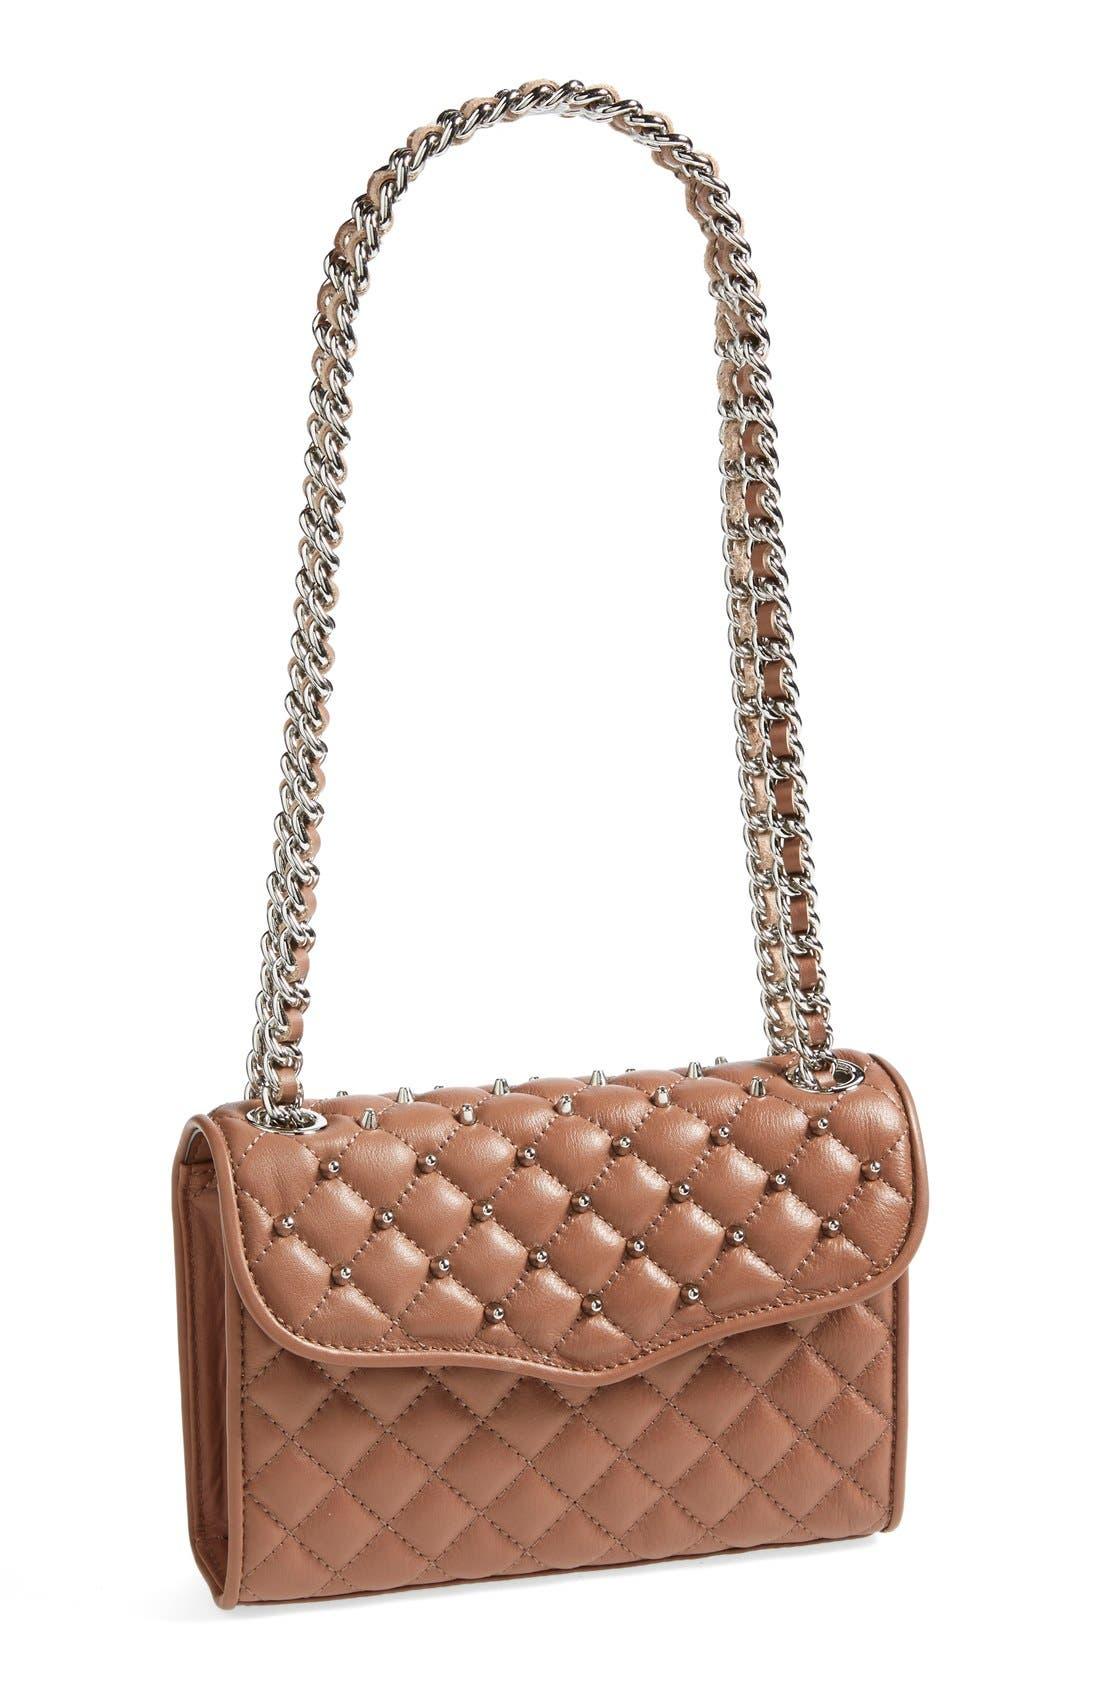 Main Image - Rebecca Minkoff 'Mini Affair with Studs' Convertible Crossbody Bag